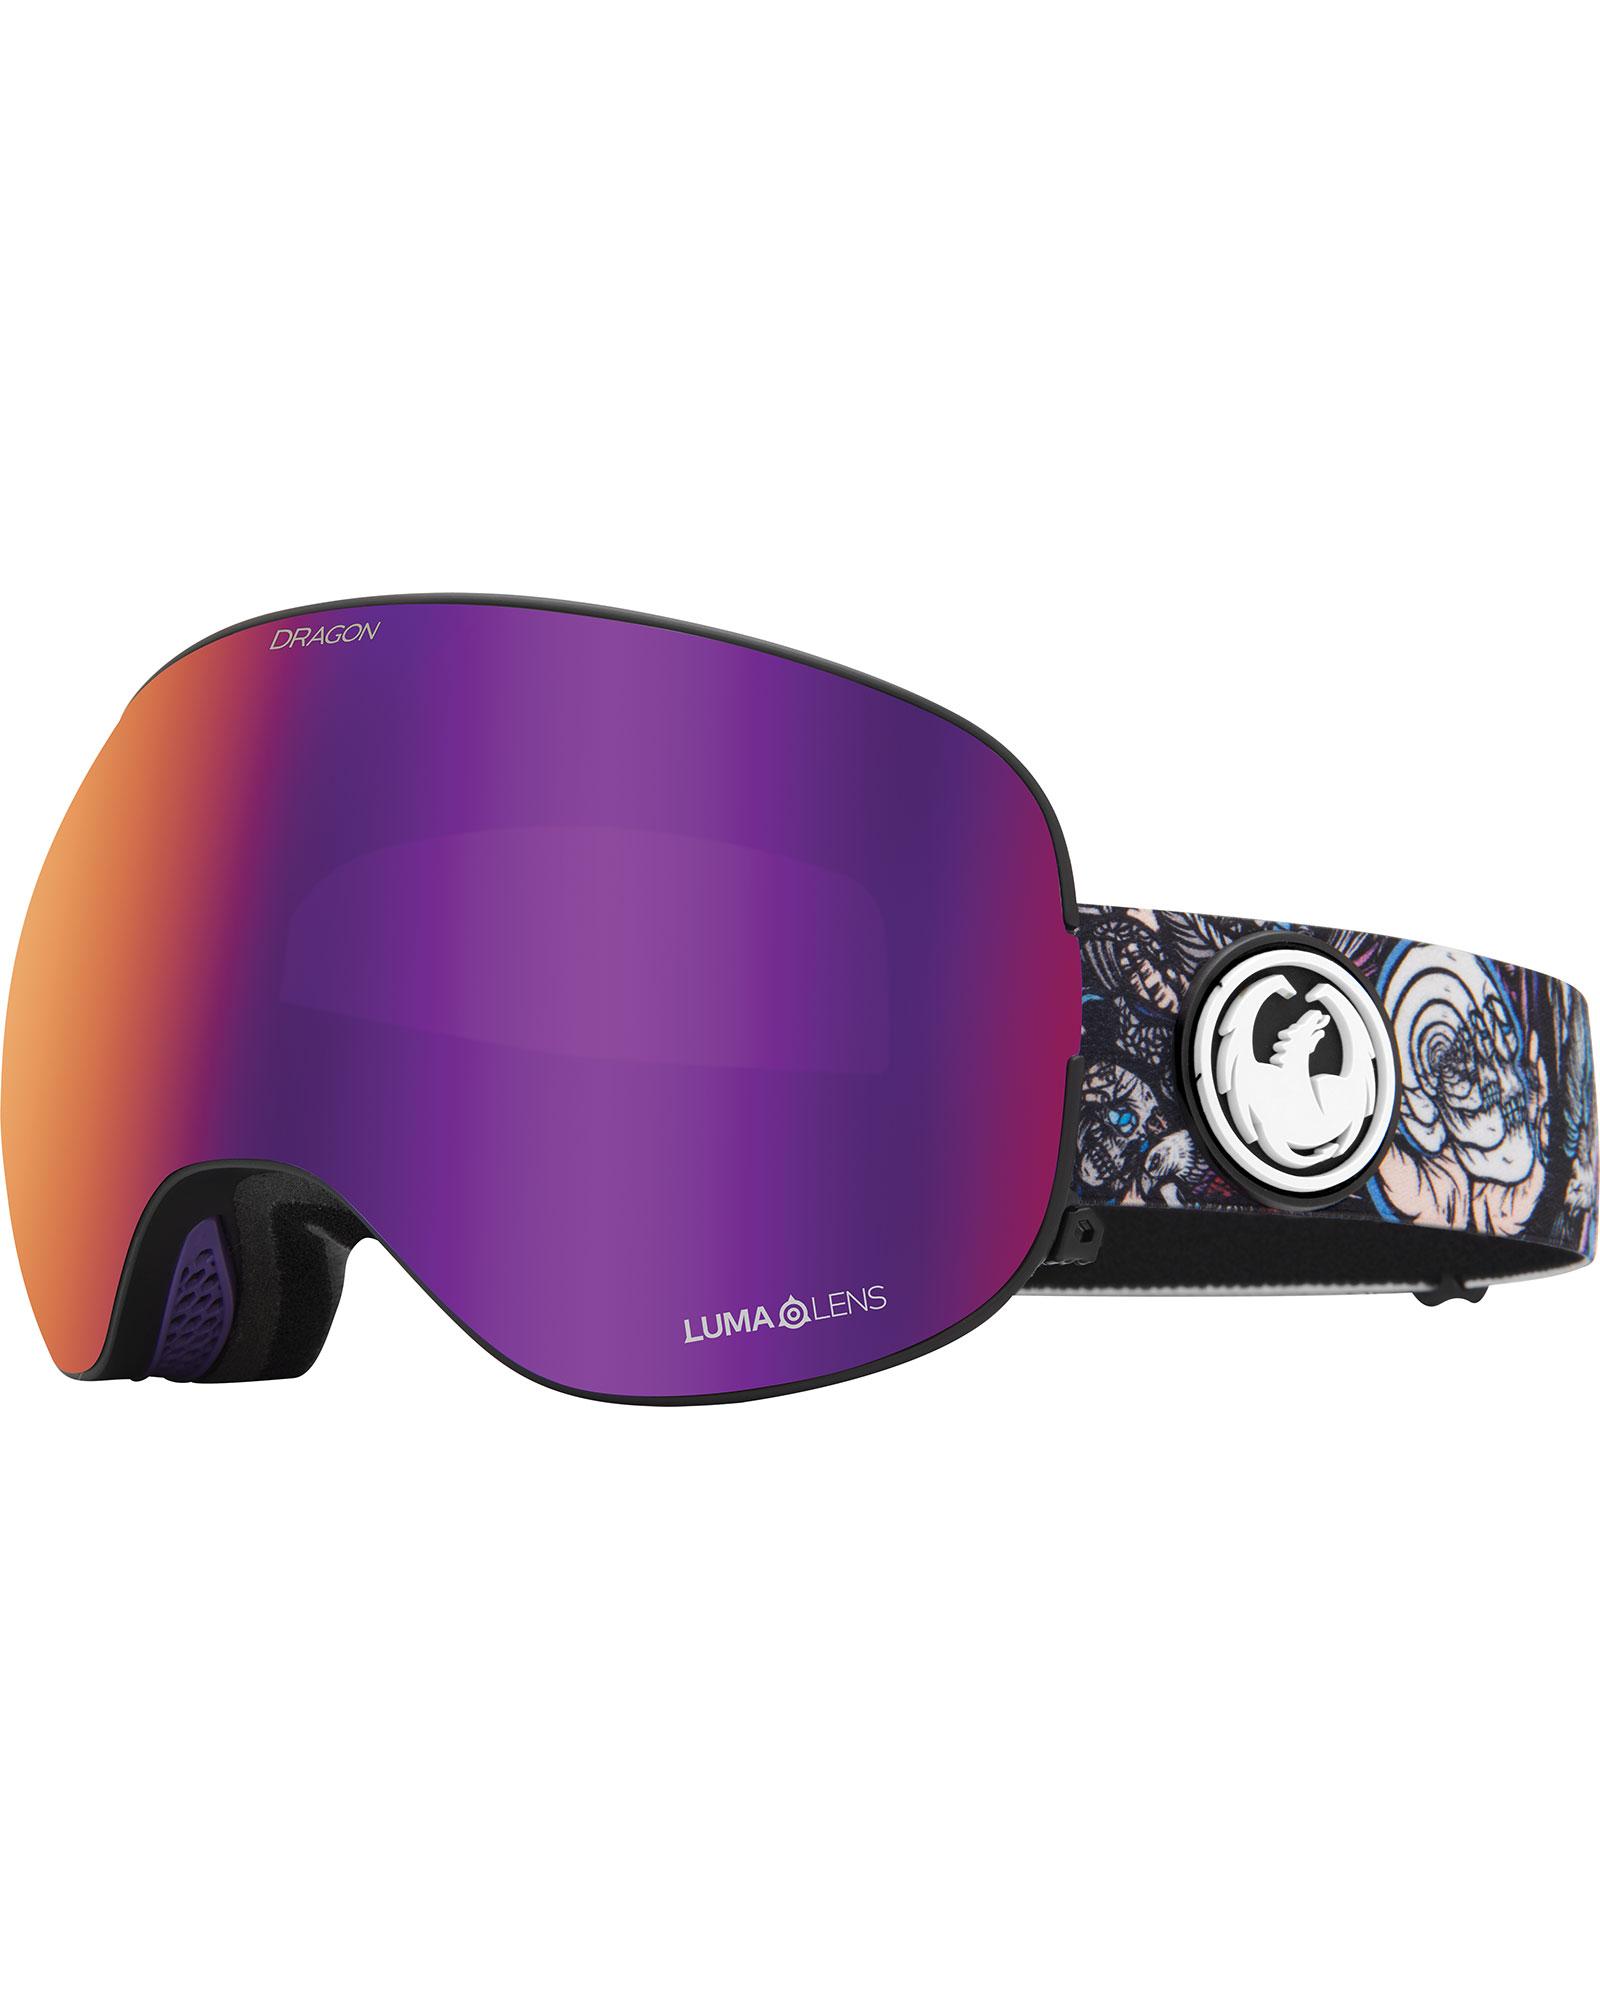 Dragon X2 Schoph D.A.P / Lumalens Purple Ionized + Lumalens Amber Goggles 2020 / 2021 0